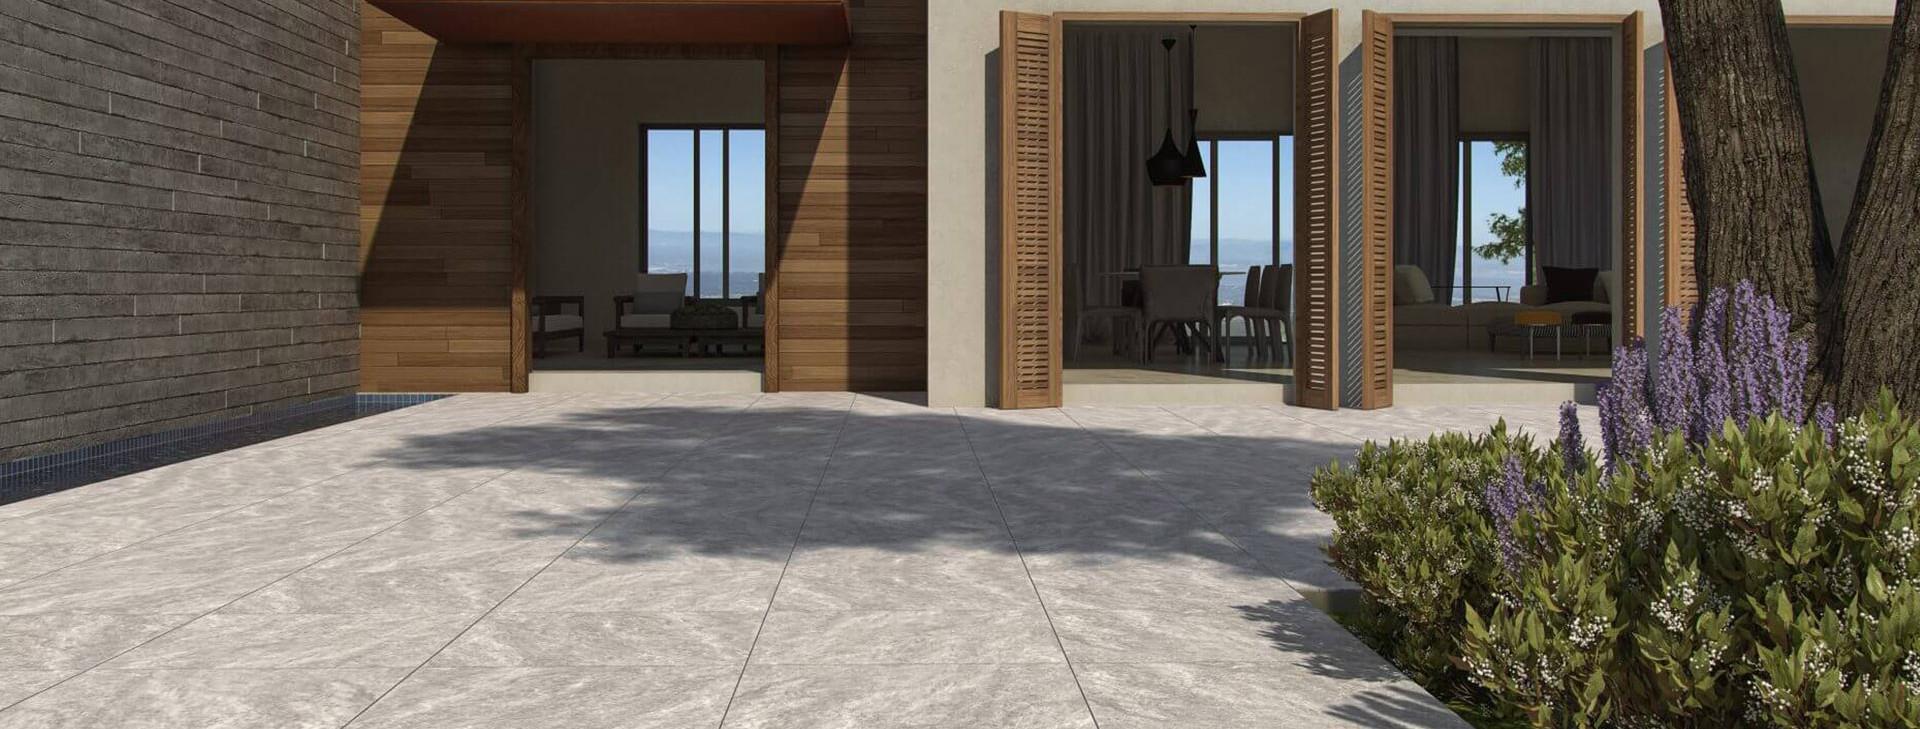 porcelanato-ambiente-externo-garagem-resistencia-piso-chao